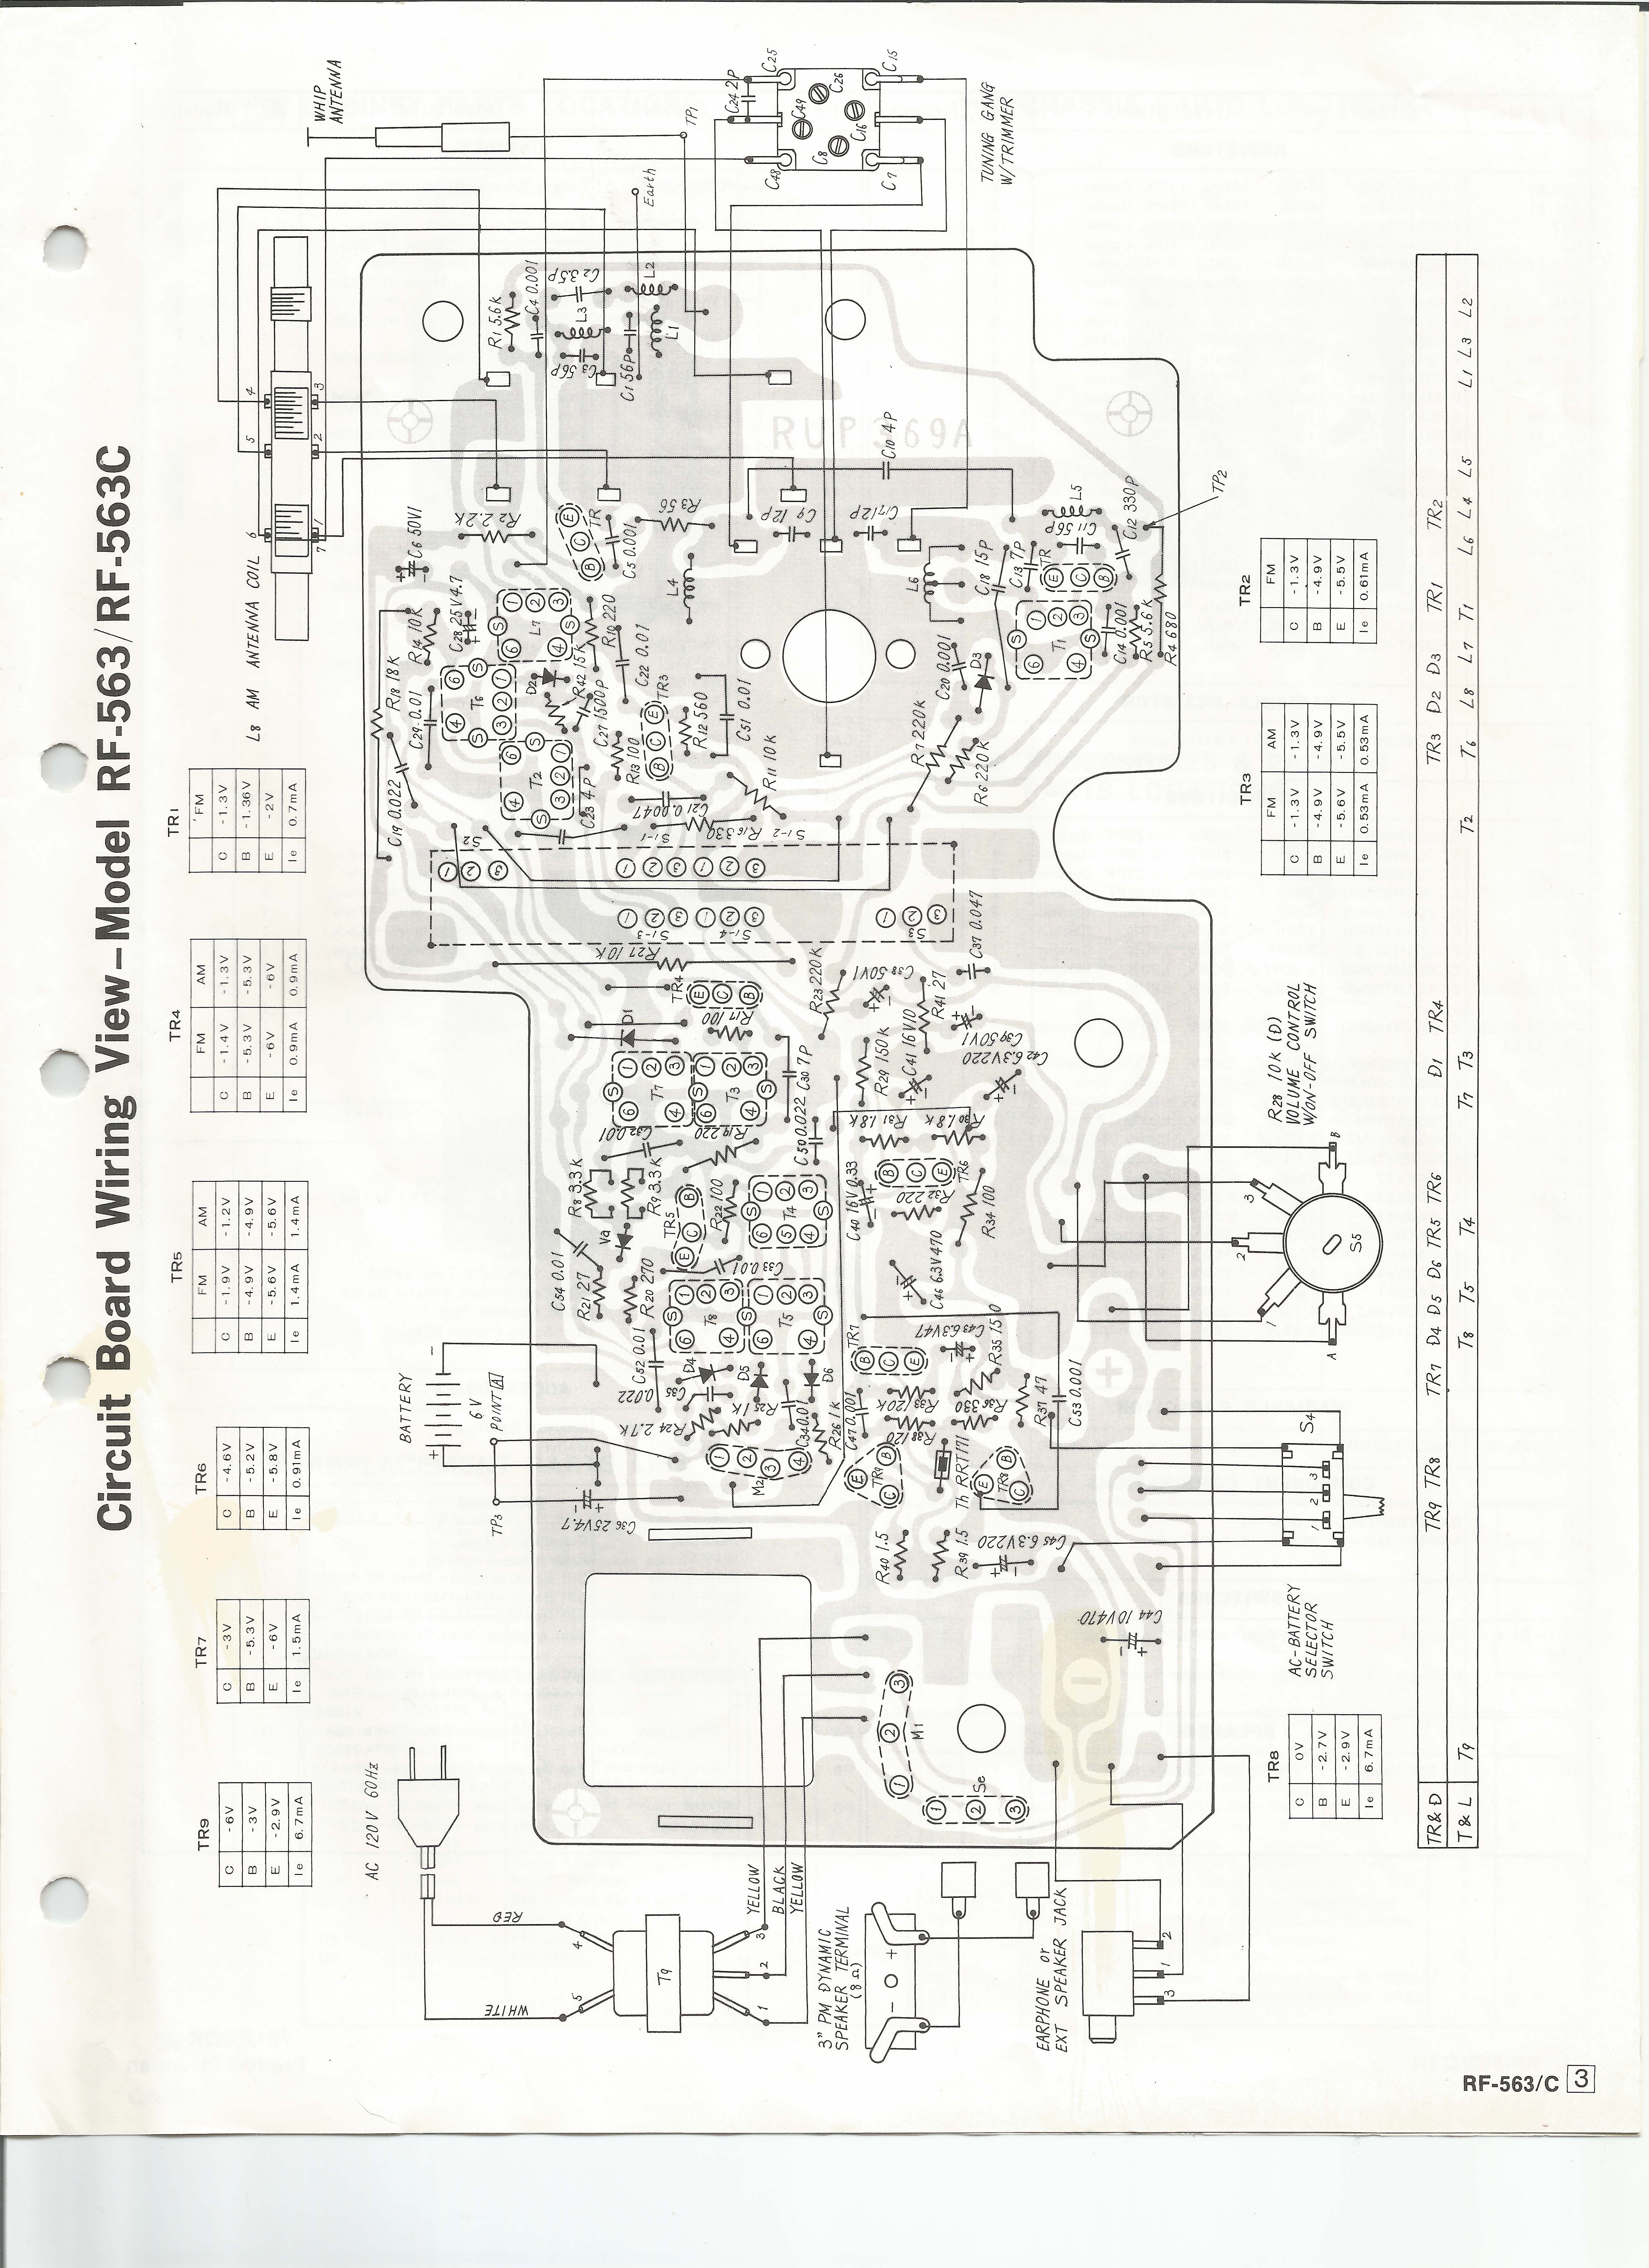 Panasonic Rf 563html Fm Radio Circuit Schematic Diagram 563 Am Radioparts Layout